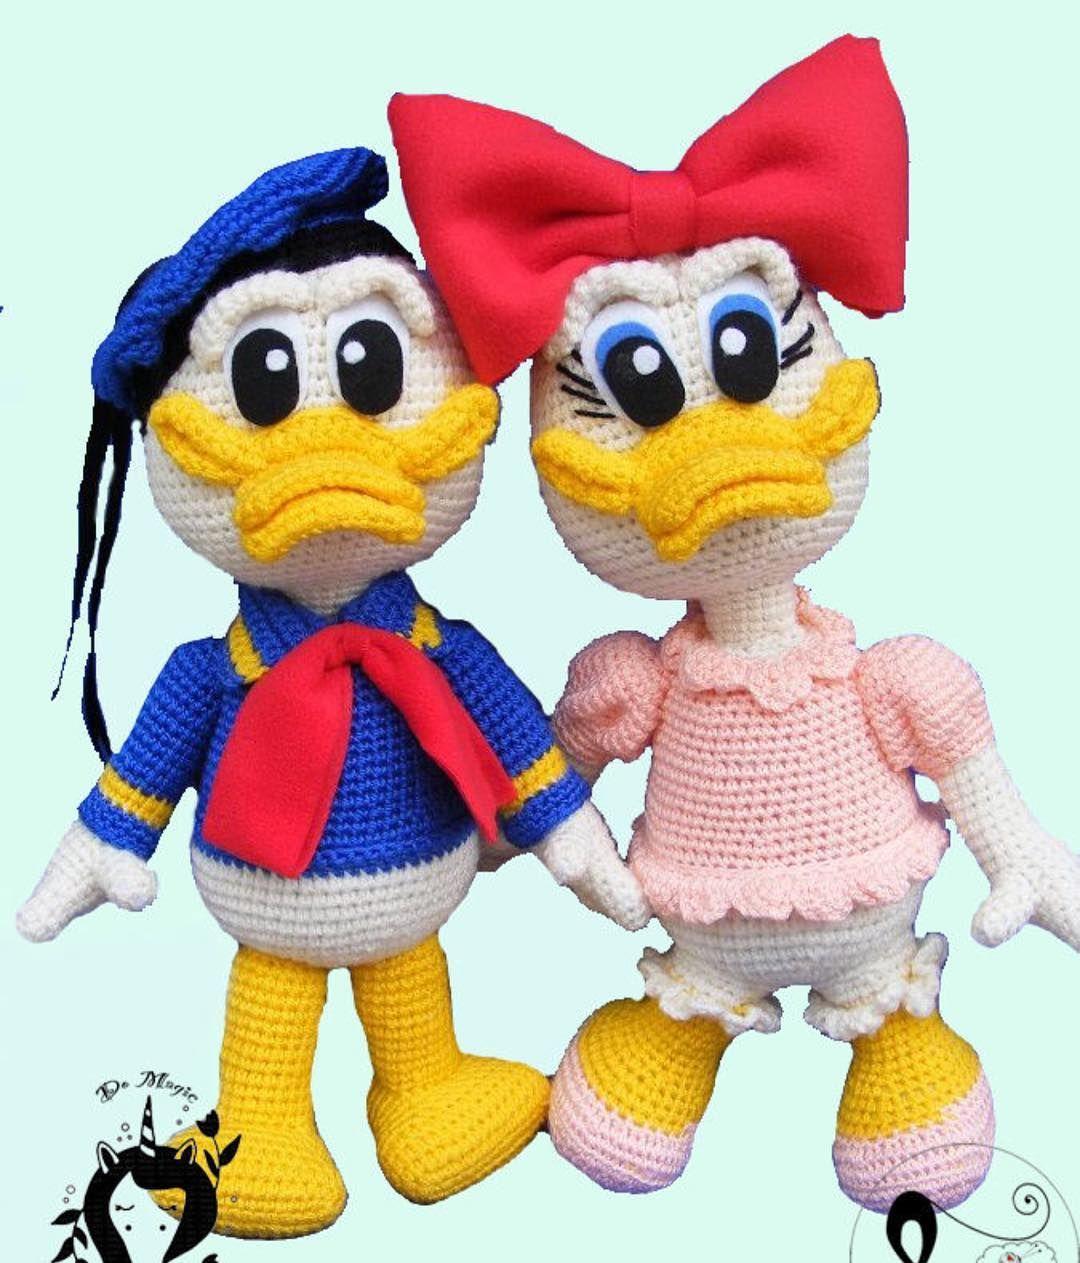 Amigurumi BEBEK ELBİSESİ Yapımı - amigurumi doll dress - YouTube   1263x1080